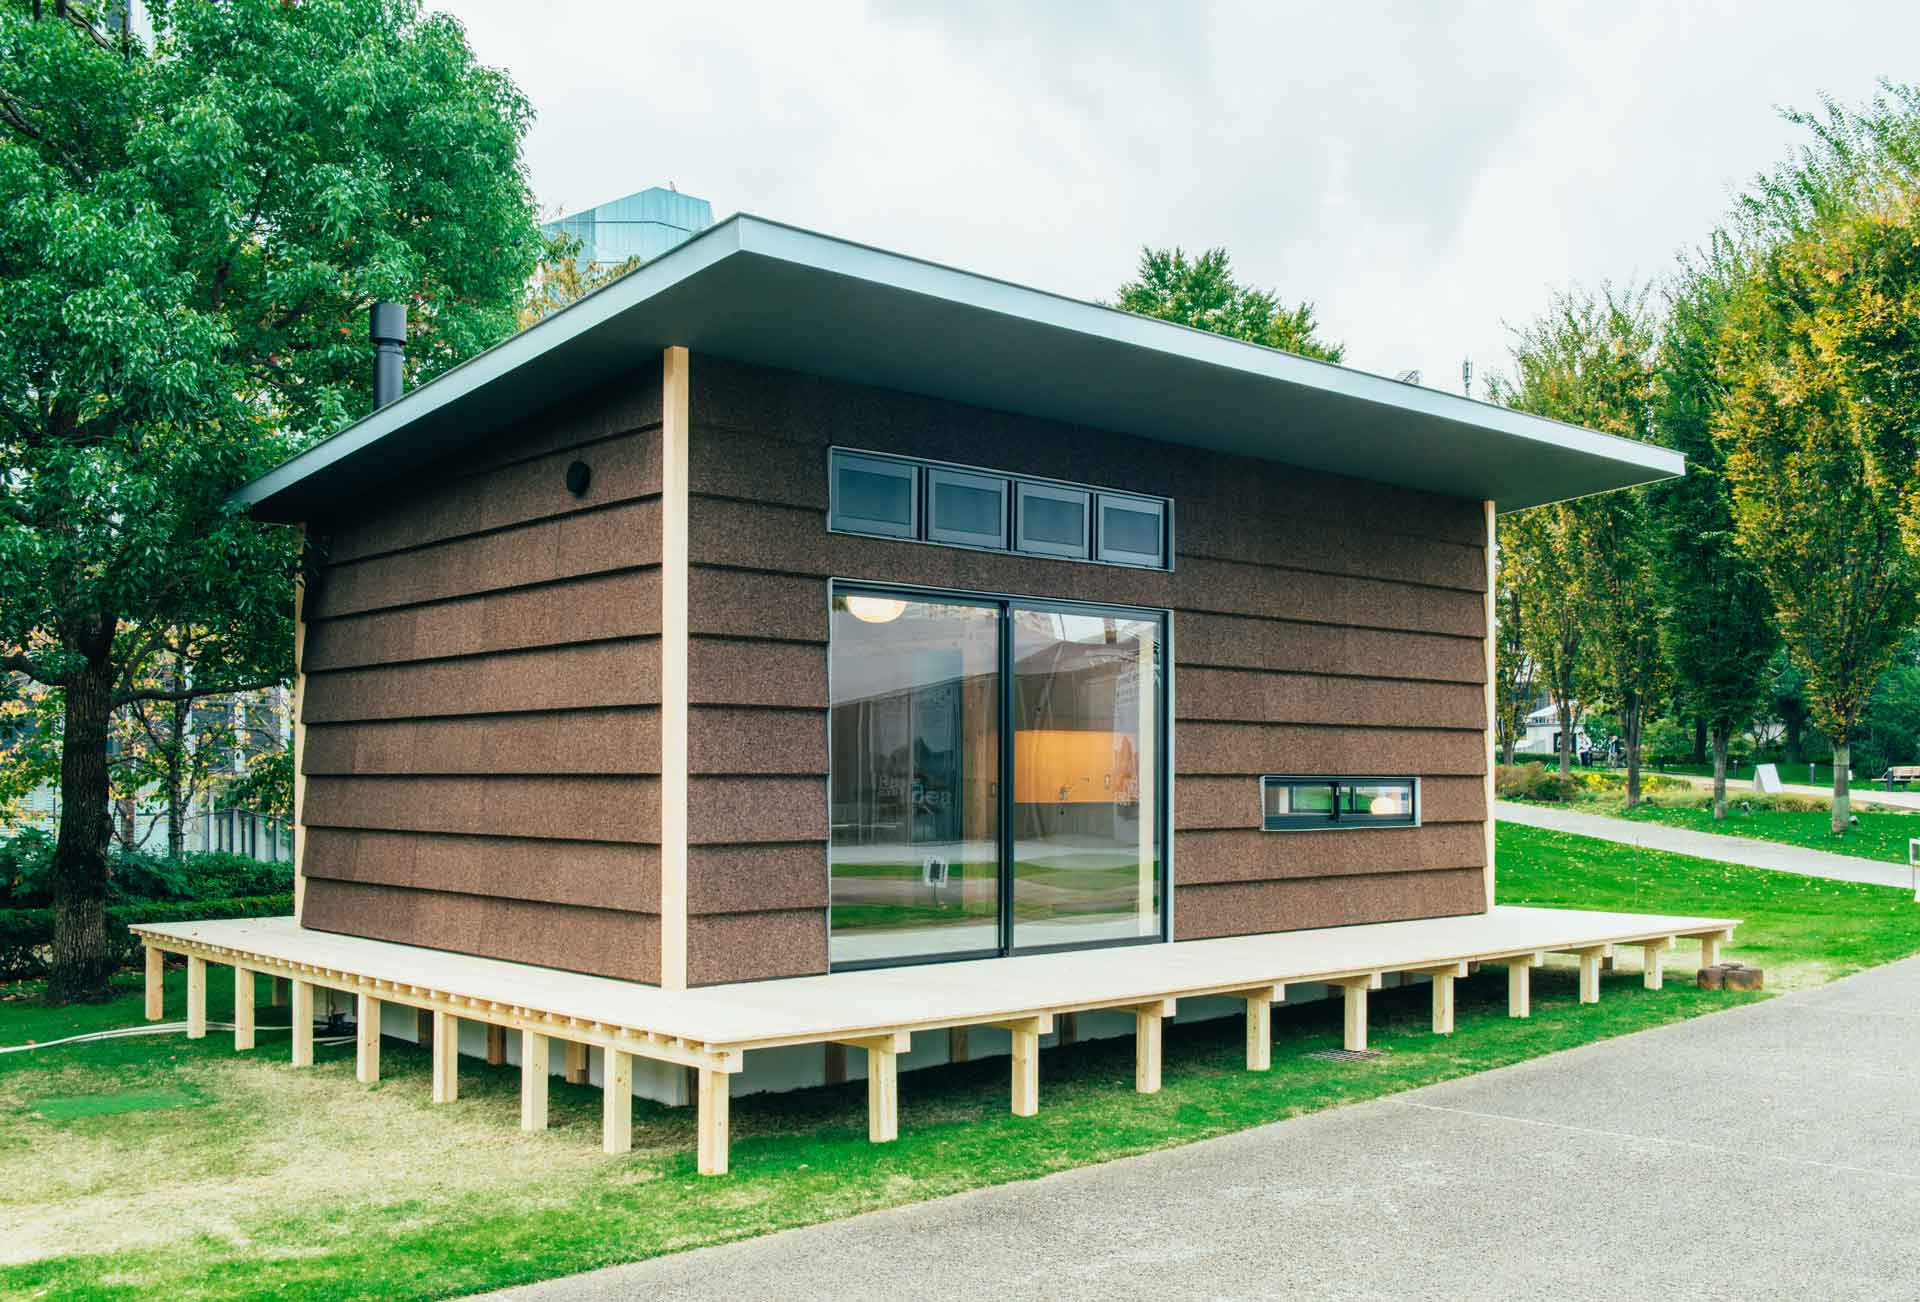 Jasper Morrison's MUJI Cork Hut